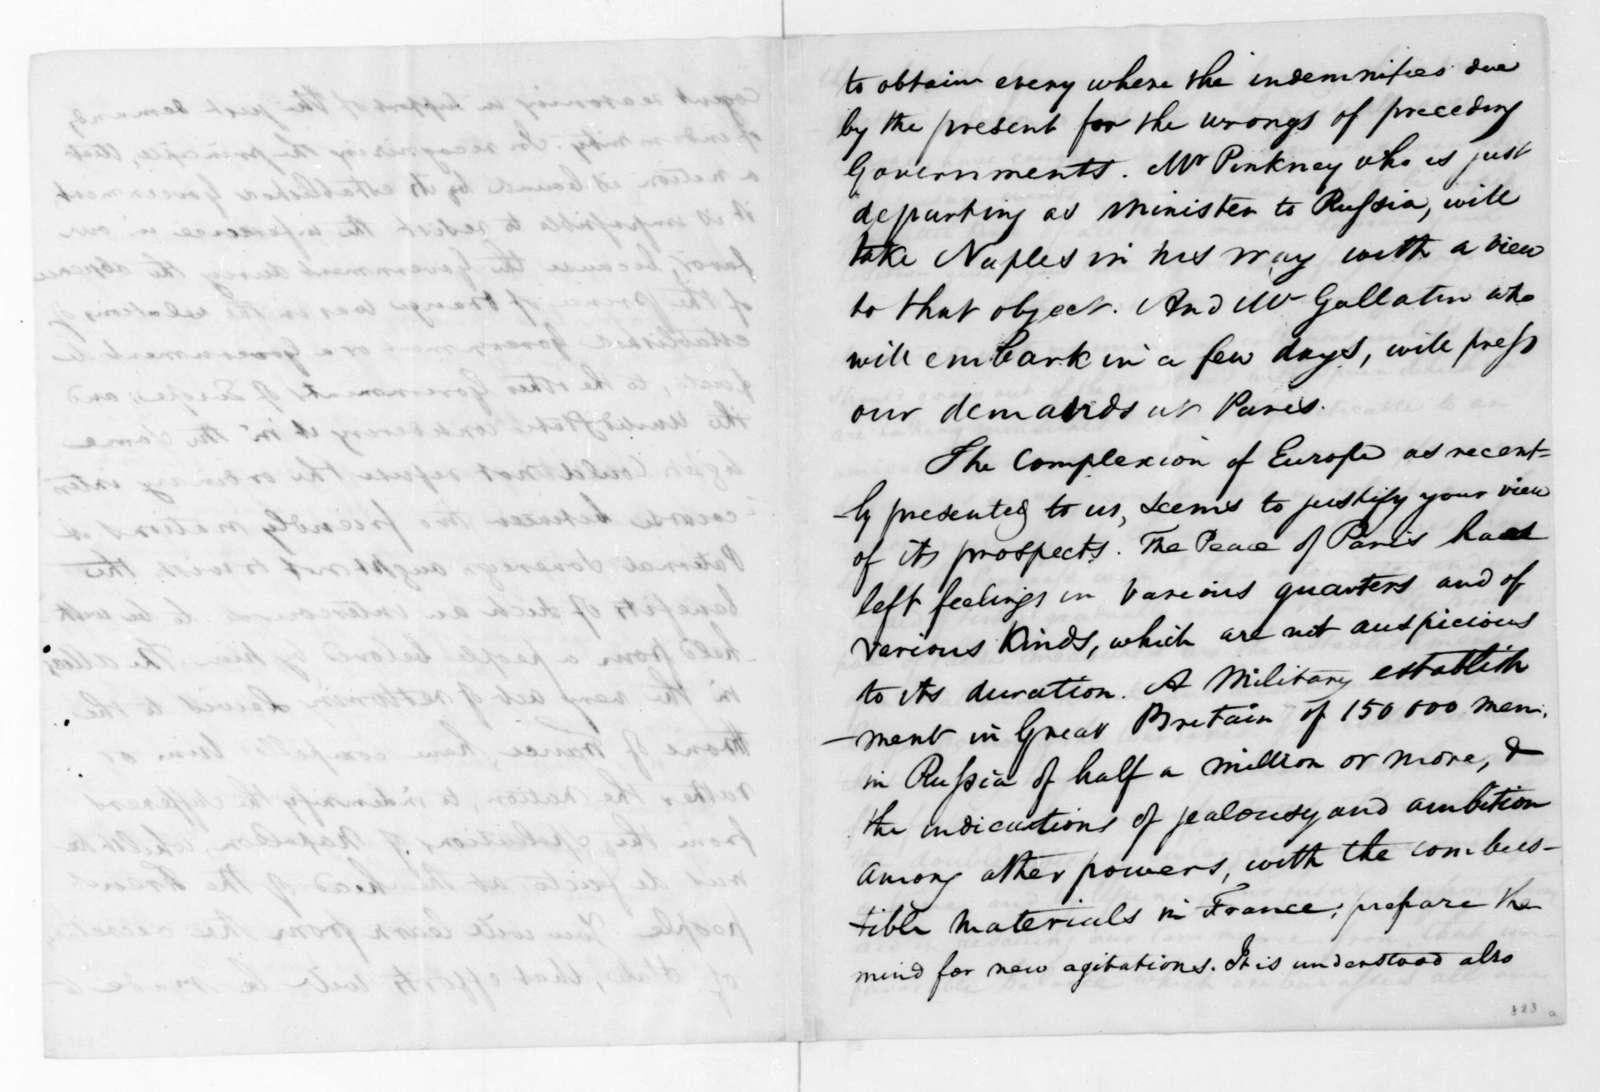 James Madison to William Eustis, May 12, 1816.